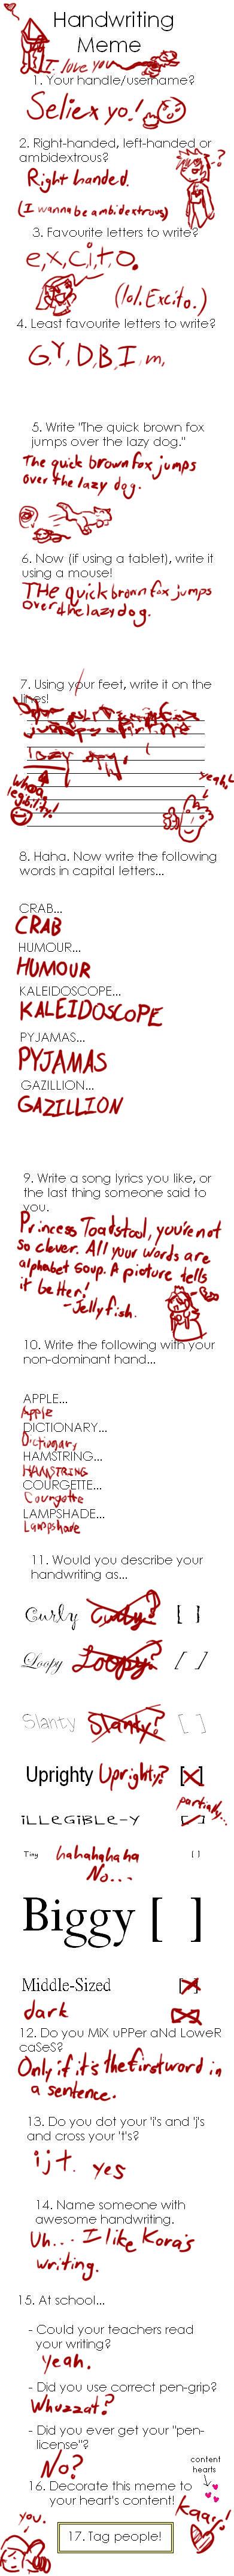 Handwriting Meme by Seliex